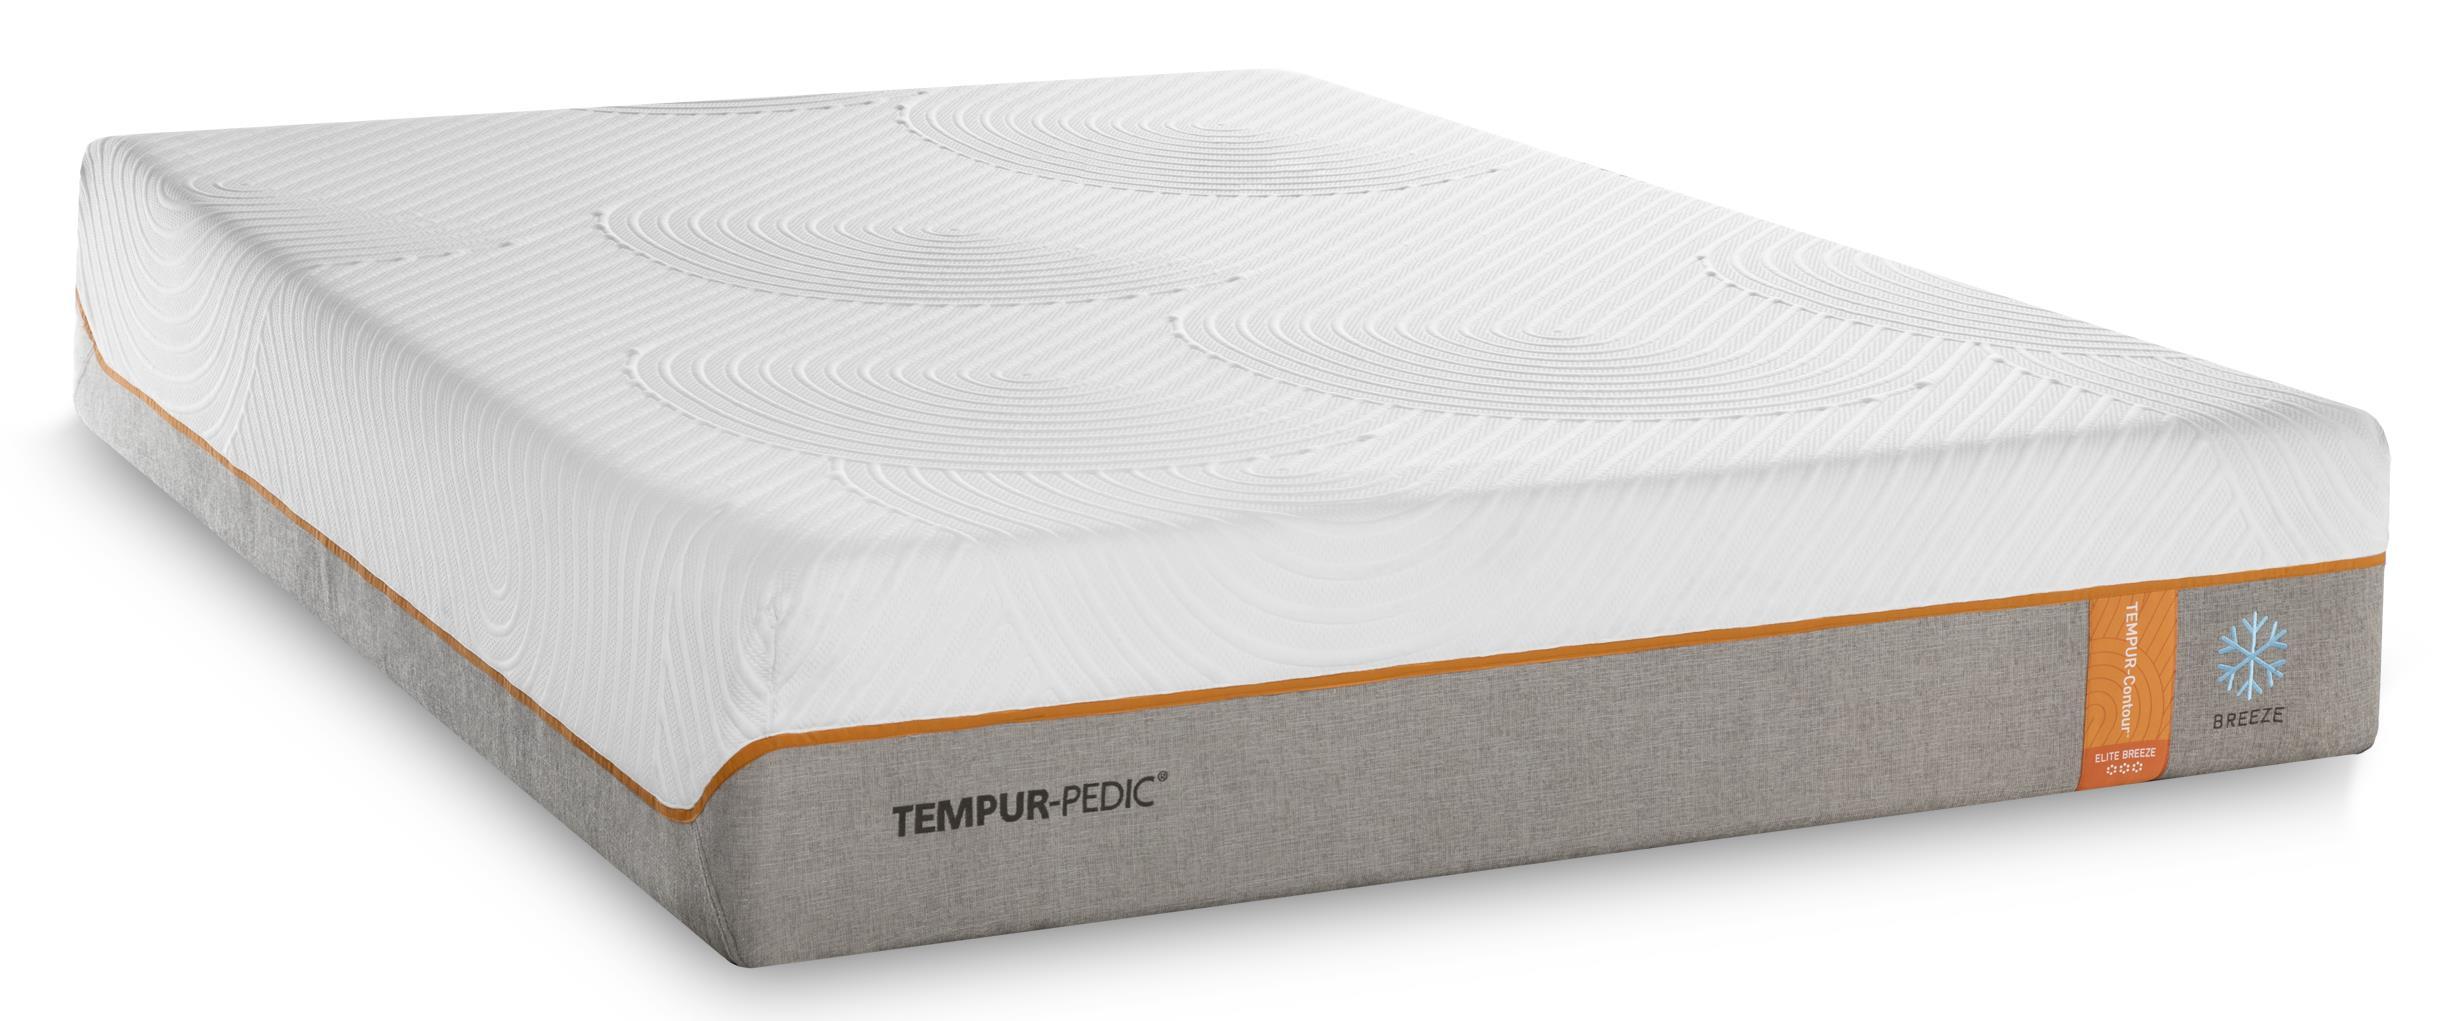 Tempur Pedic TEMPUR Contour Elite Breeze King Medium Firm